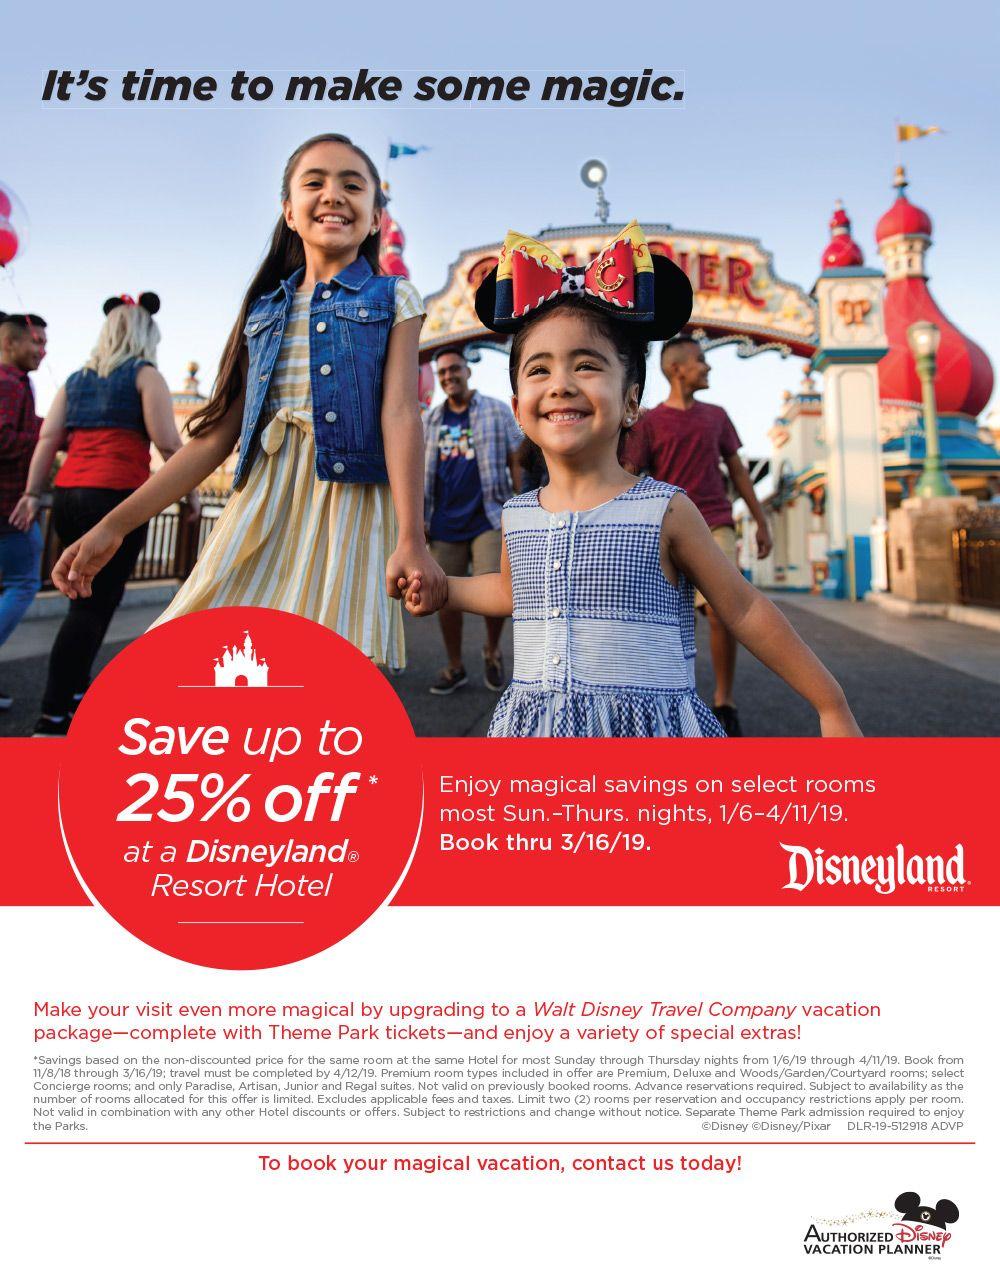 2019 Disneyland Winter Savings Disney Discounts Disneyland Resort Hotel Disneyland Discounts